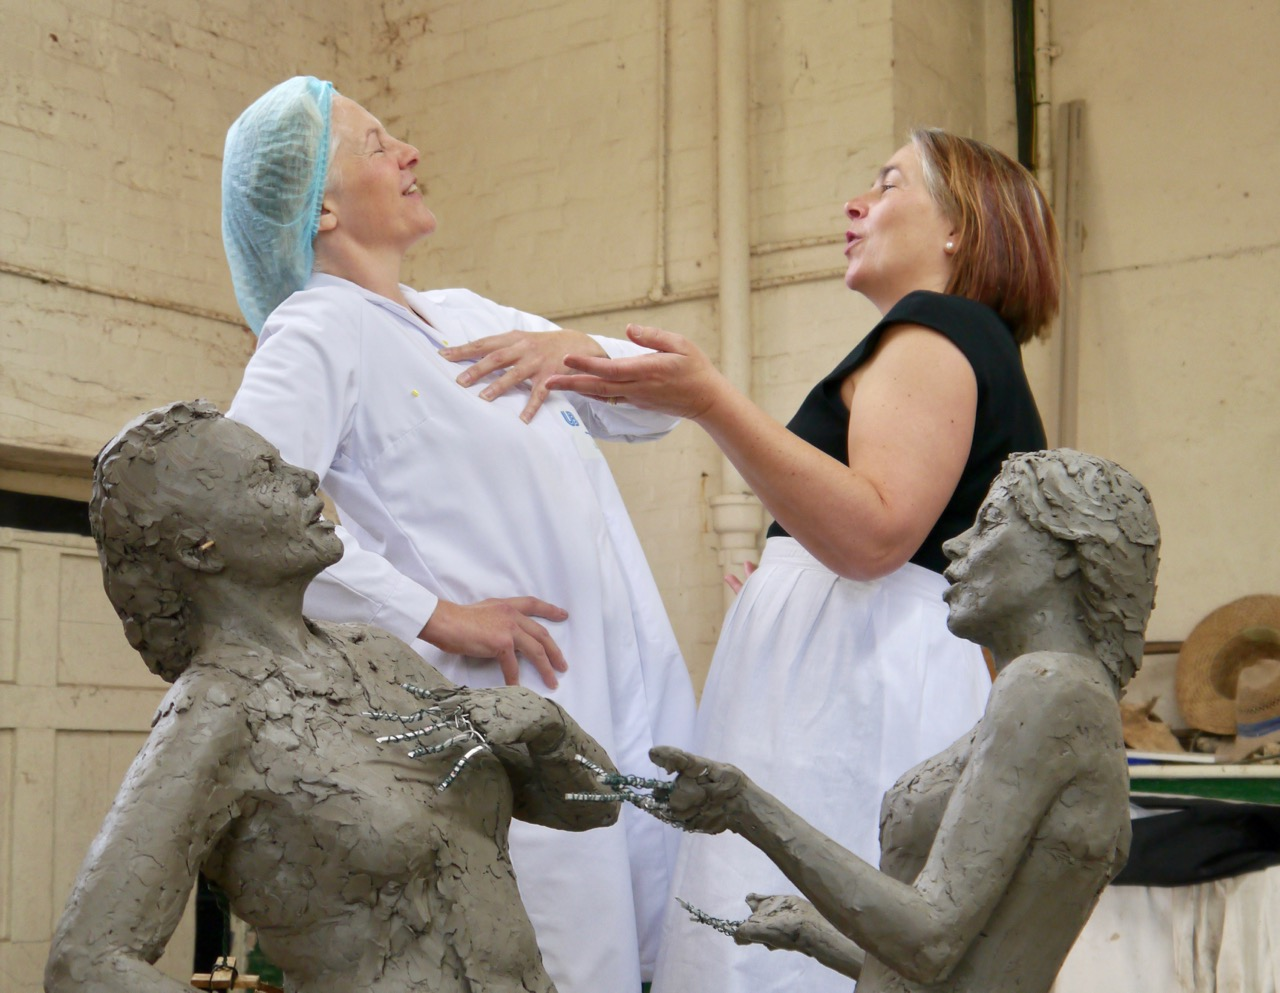 Hazel speaks at Feminist Public Sculpture Research Forum